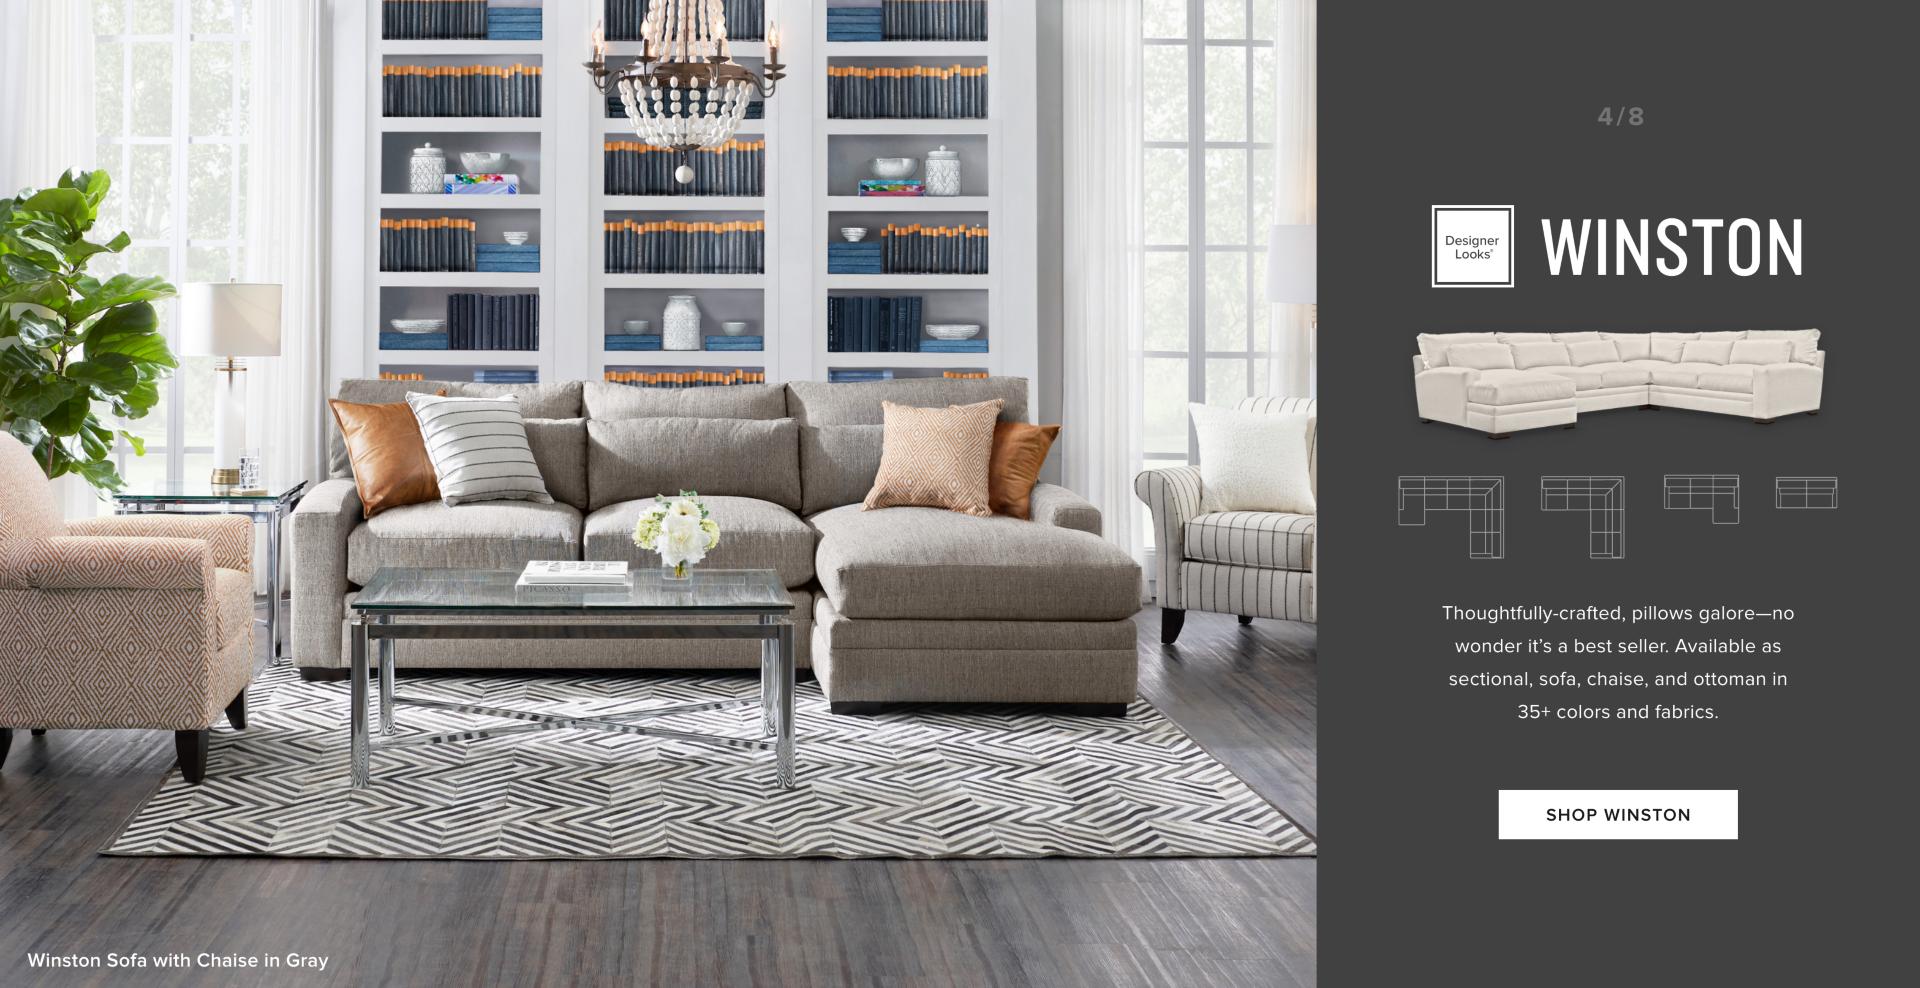 Make It You - Custom Winston Furniture